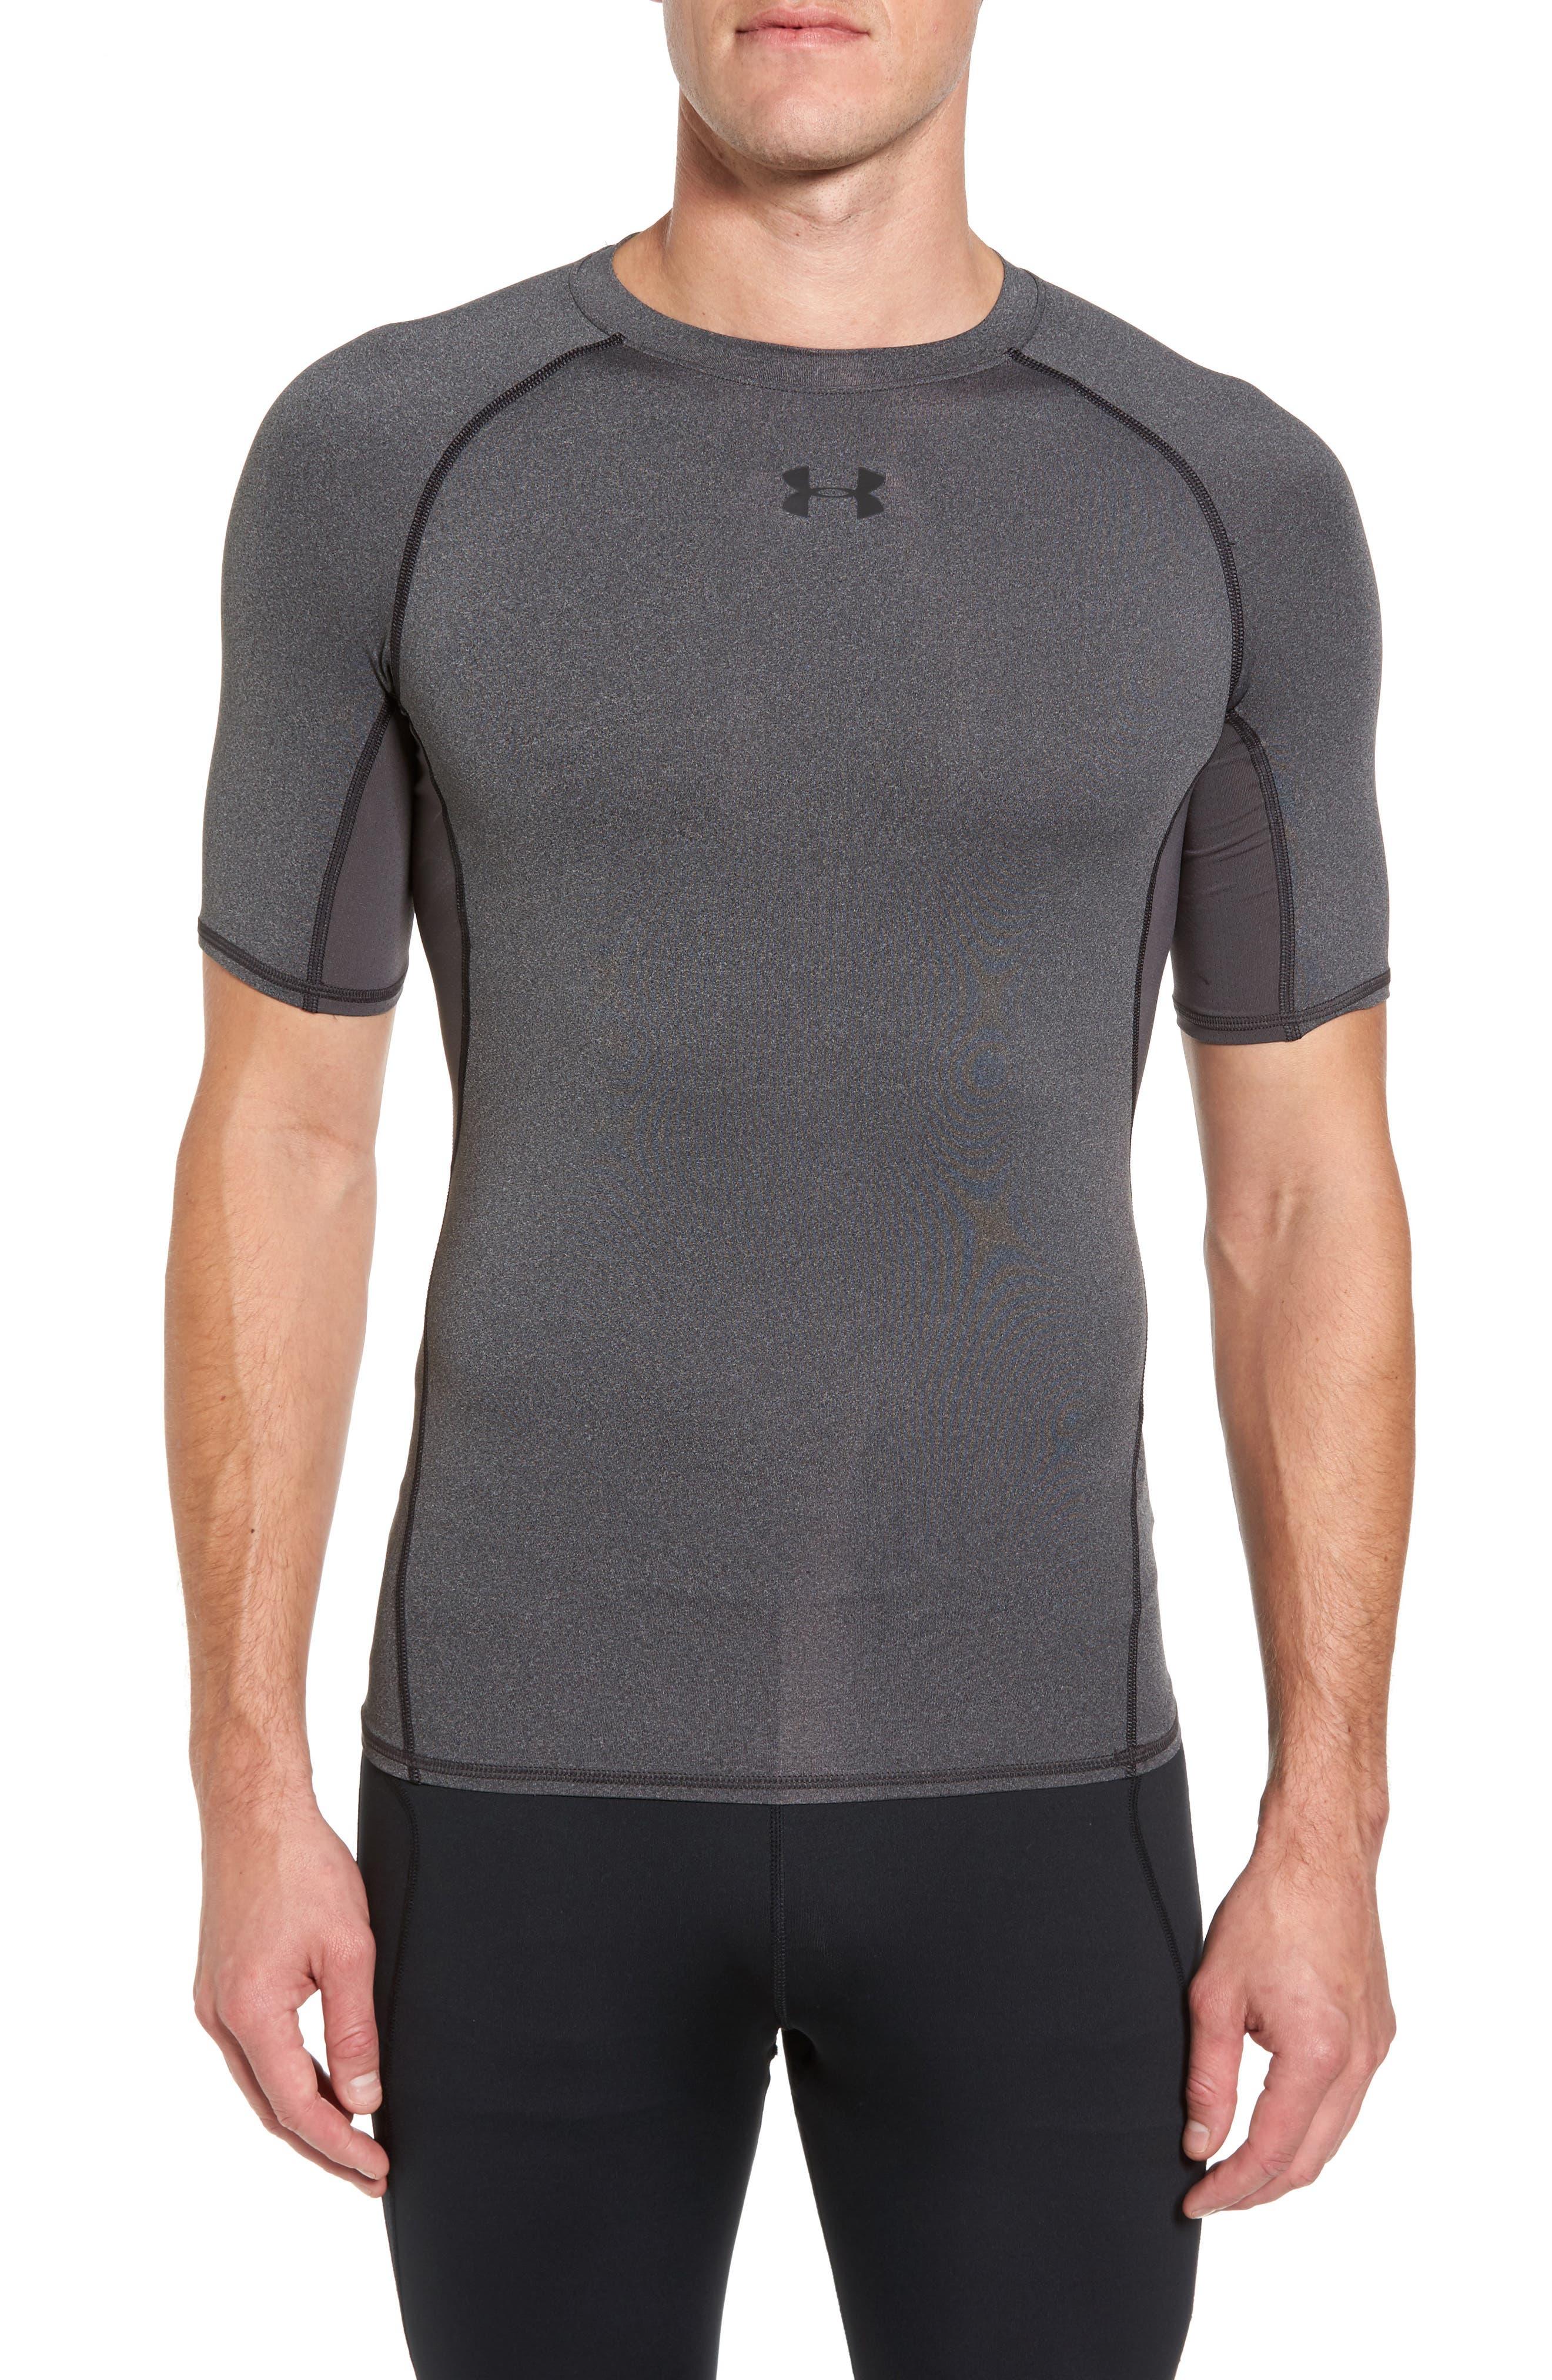 HeatGear<sup>®</sup> Compression Fit T-Shirt,                             Alternate thumbnail 2, color,                             CARBON HEATHER/ BLACK